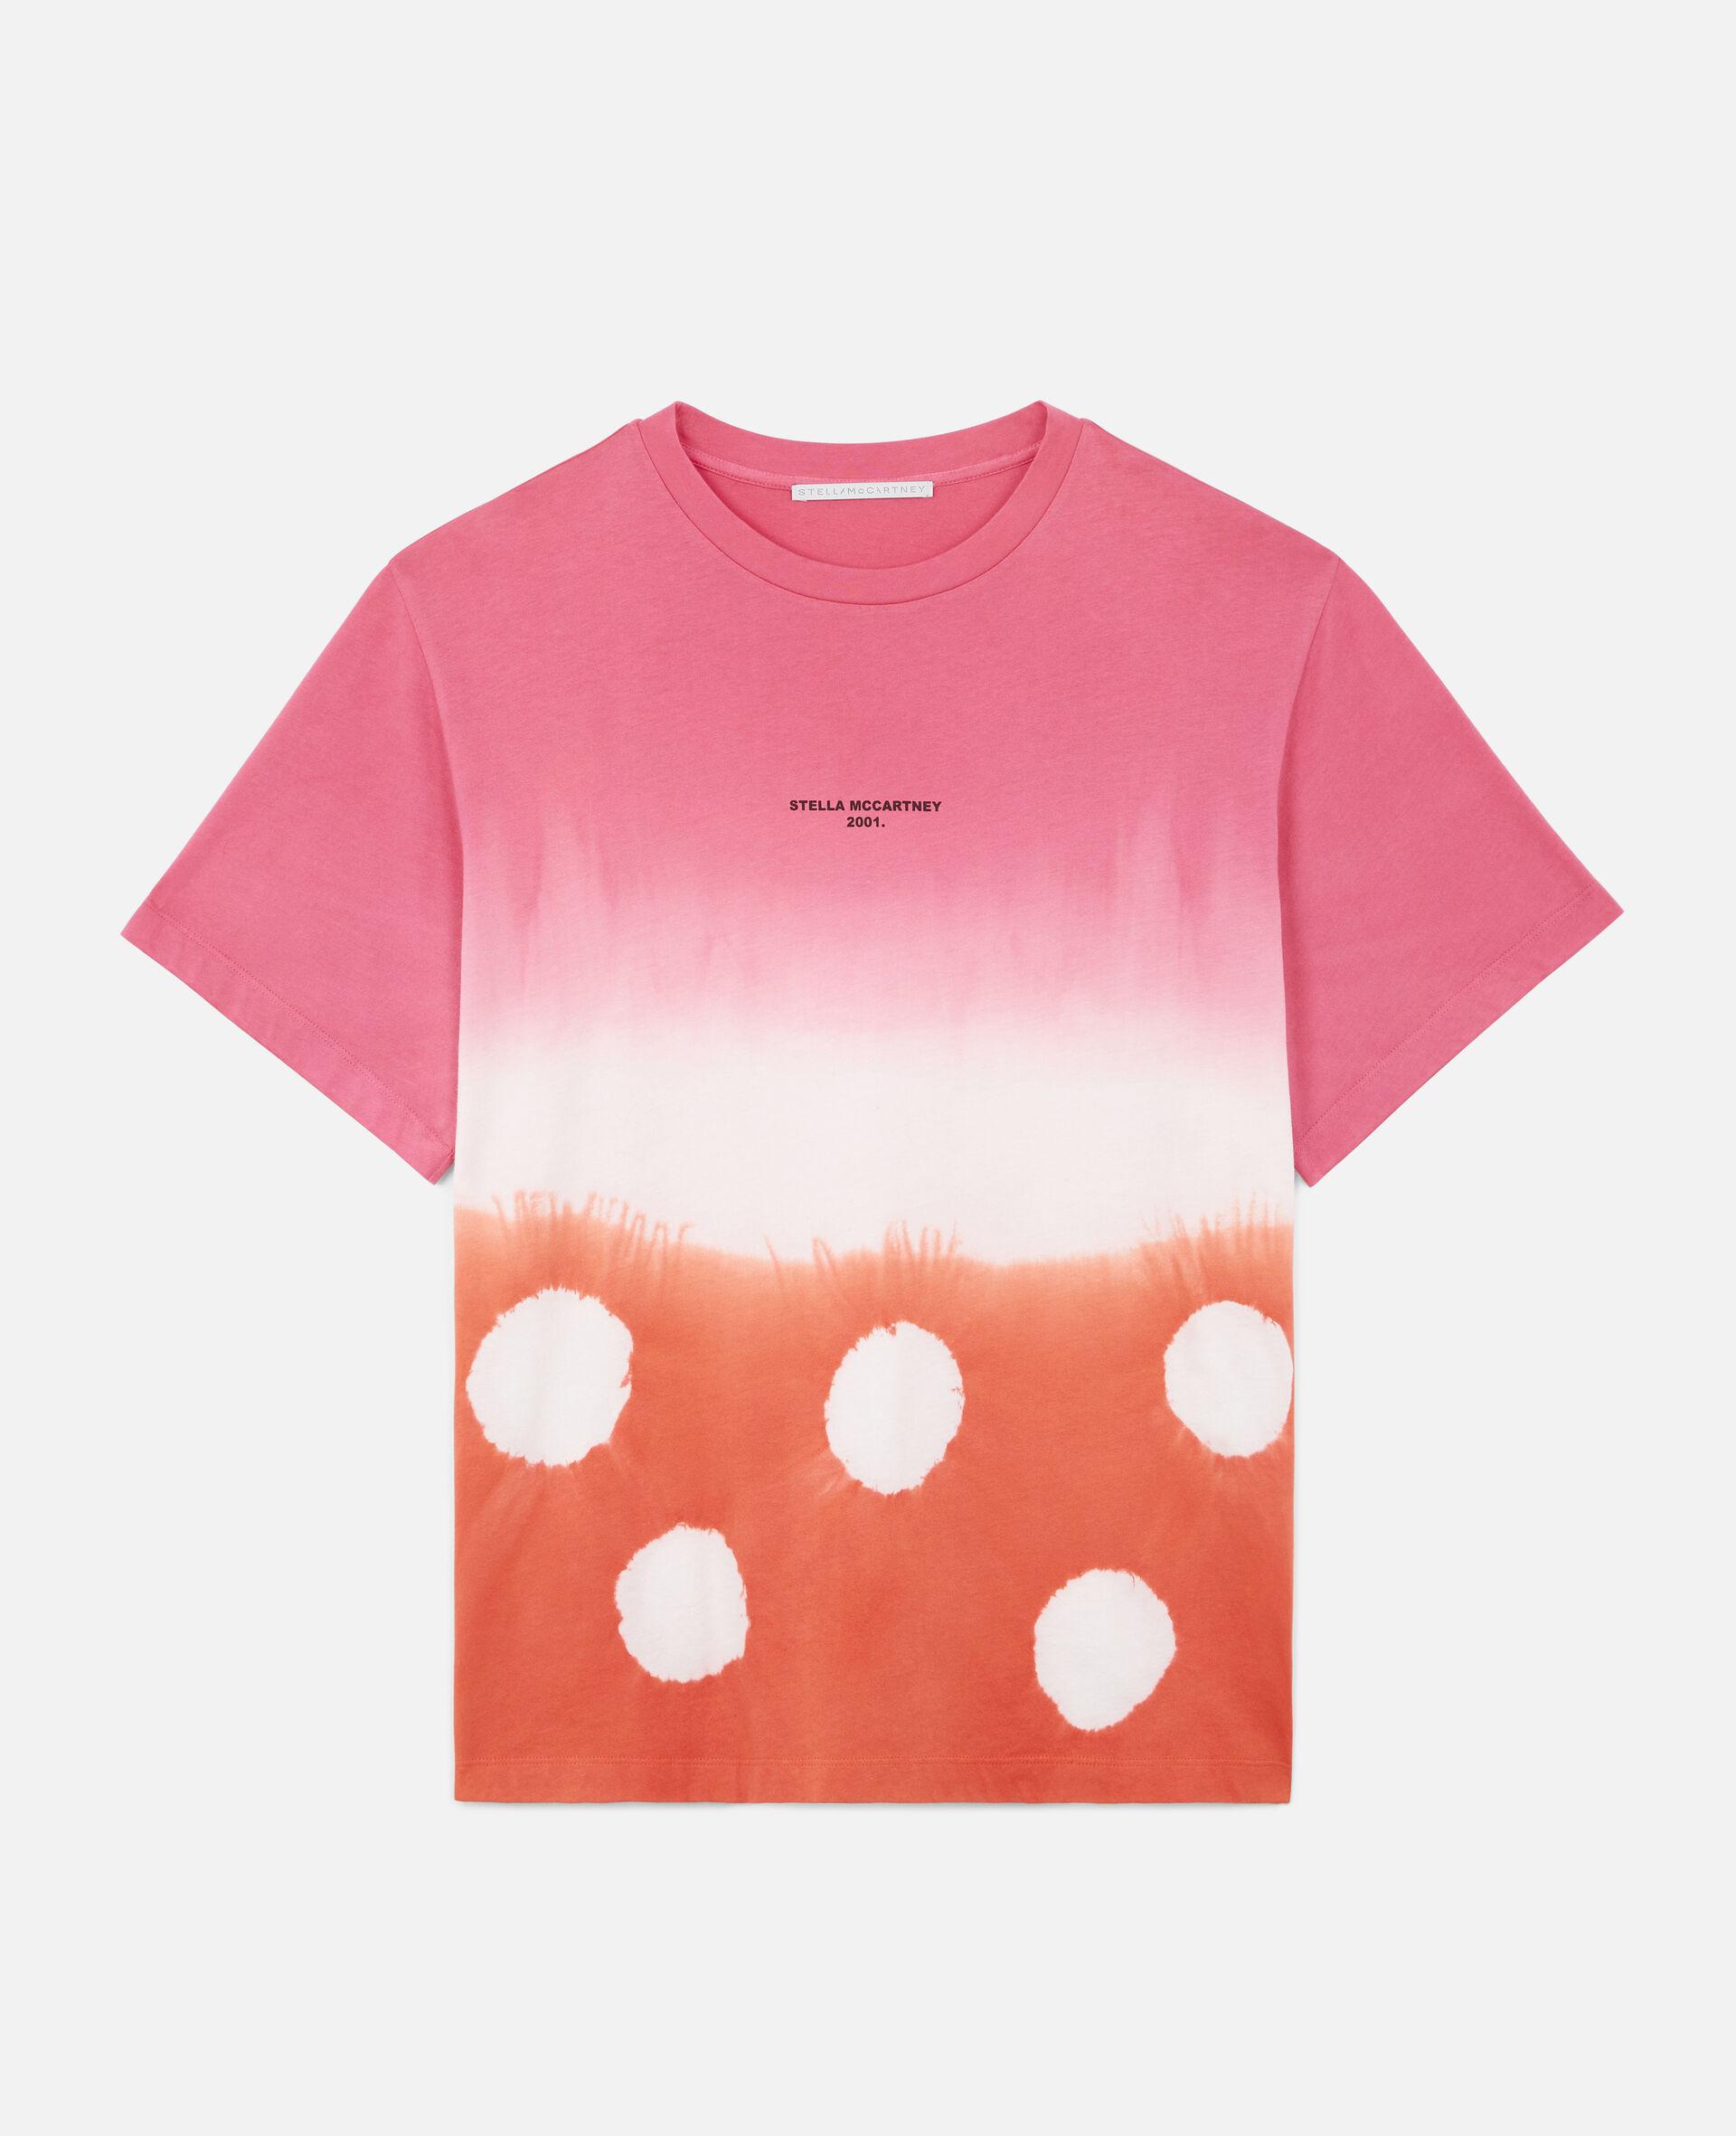 Stella McCartney 2001.' 扎染 T 恤-Multicolored-large image number 0